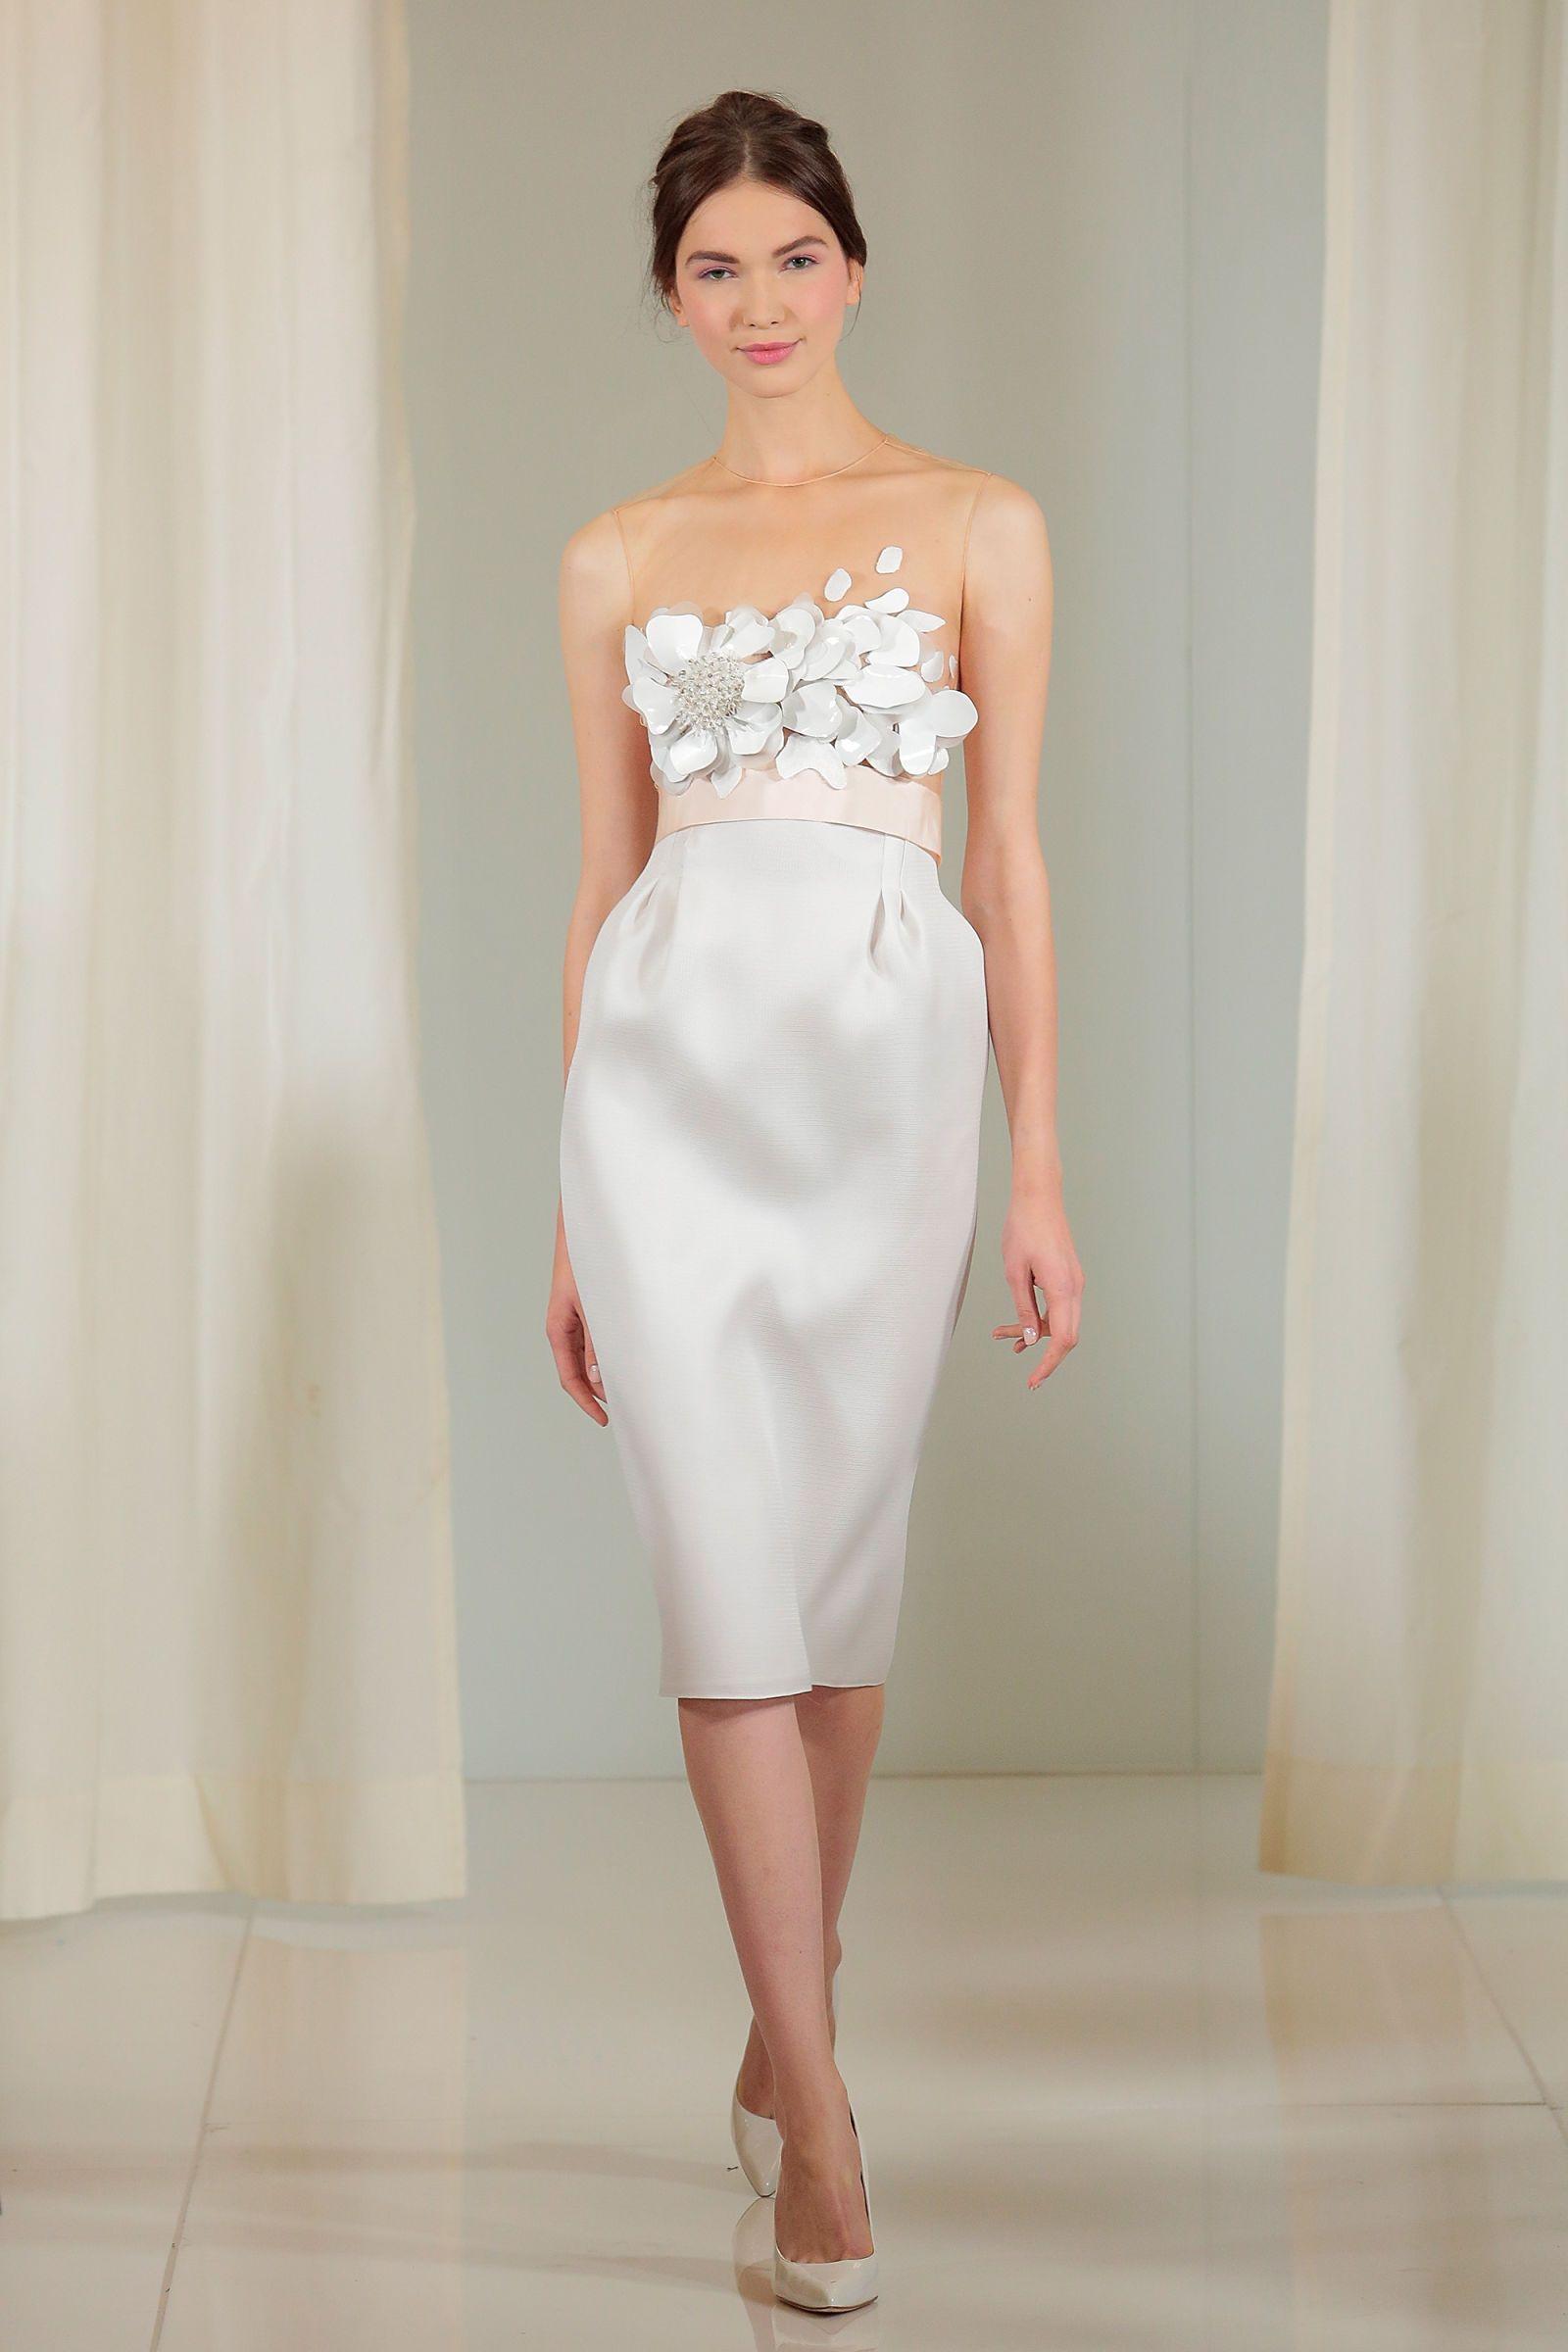 The+Best+Short+Wedding+Dresses+at+Bridal+Fashion+Week+  - ELLE.com